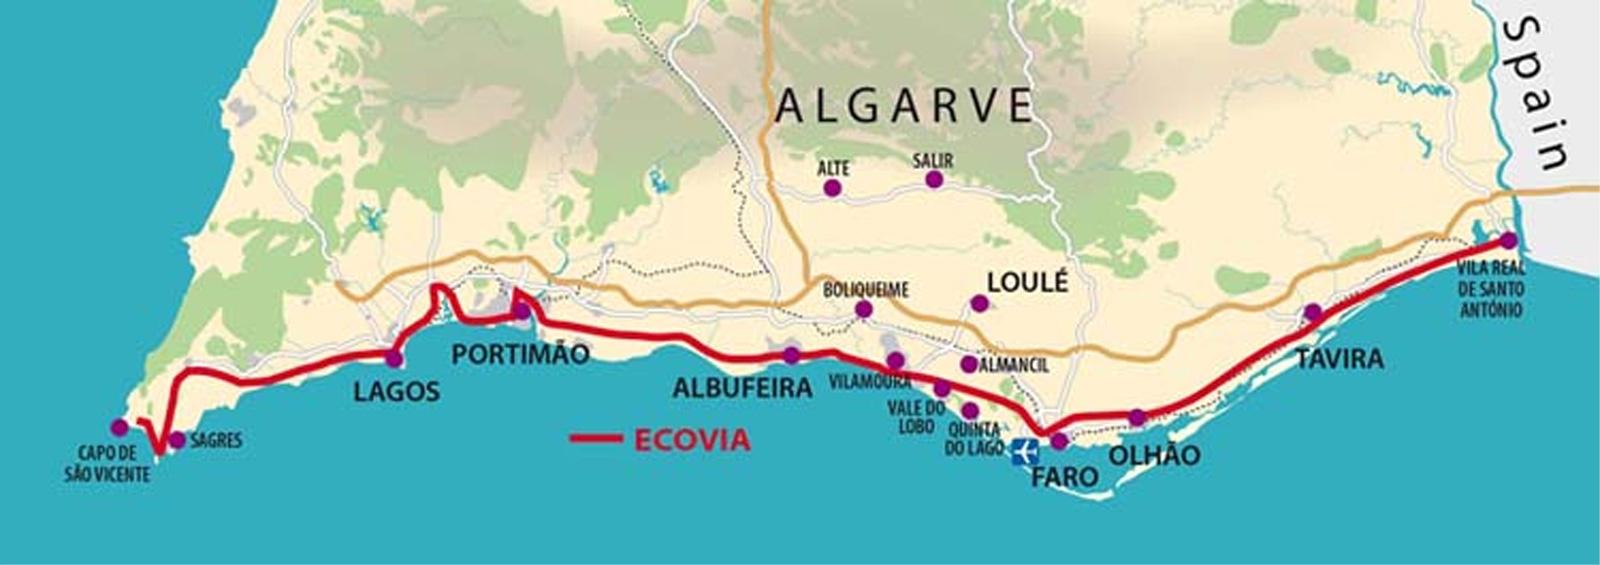 Ecovia Litoral Do Algarve Algarve Portal